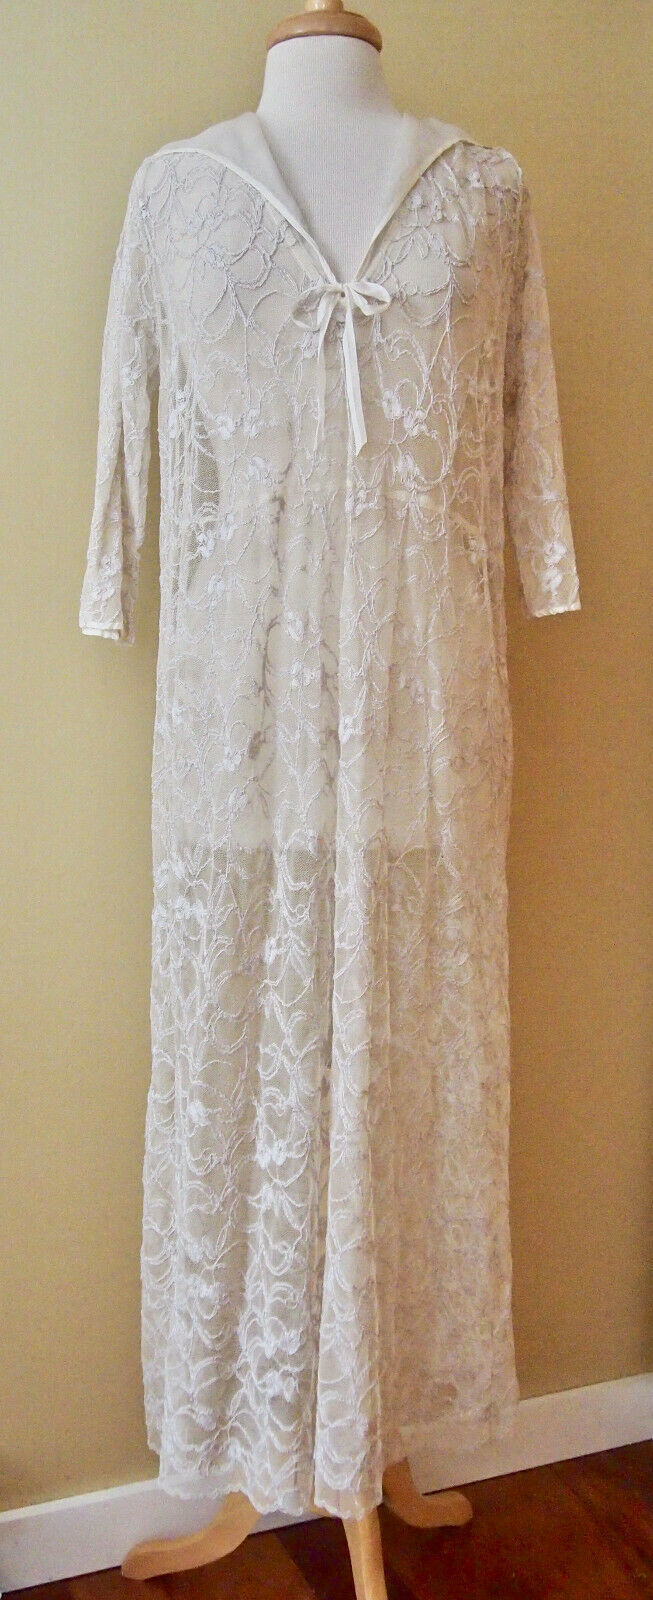 NOLA TRUE Cream LACE Sailor DRESS Tea Length CHAGRIN FALLS Boutique  OS